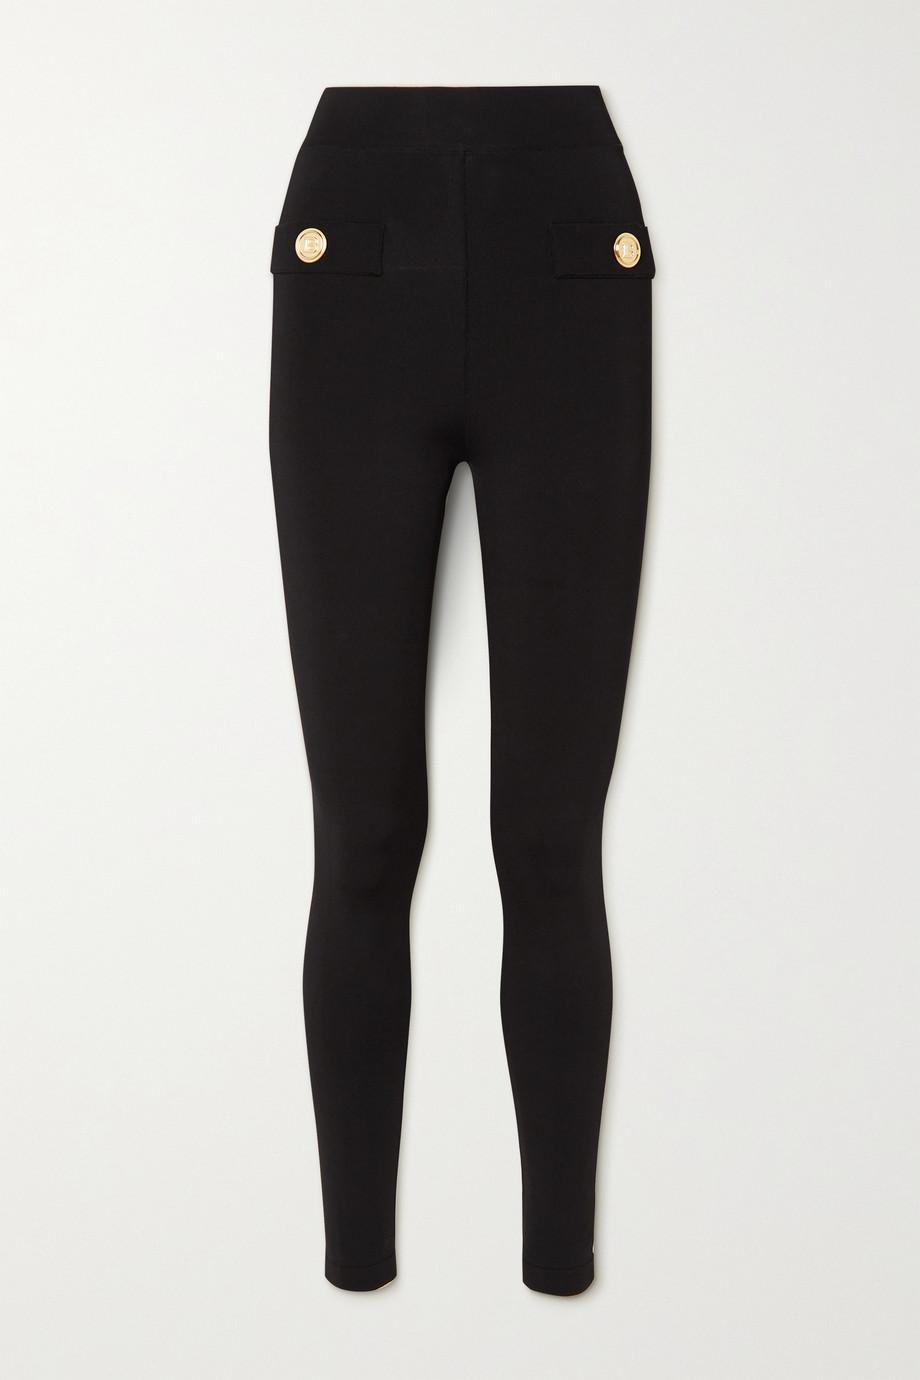 Balmain Button-embellished stretch-ponte leggings